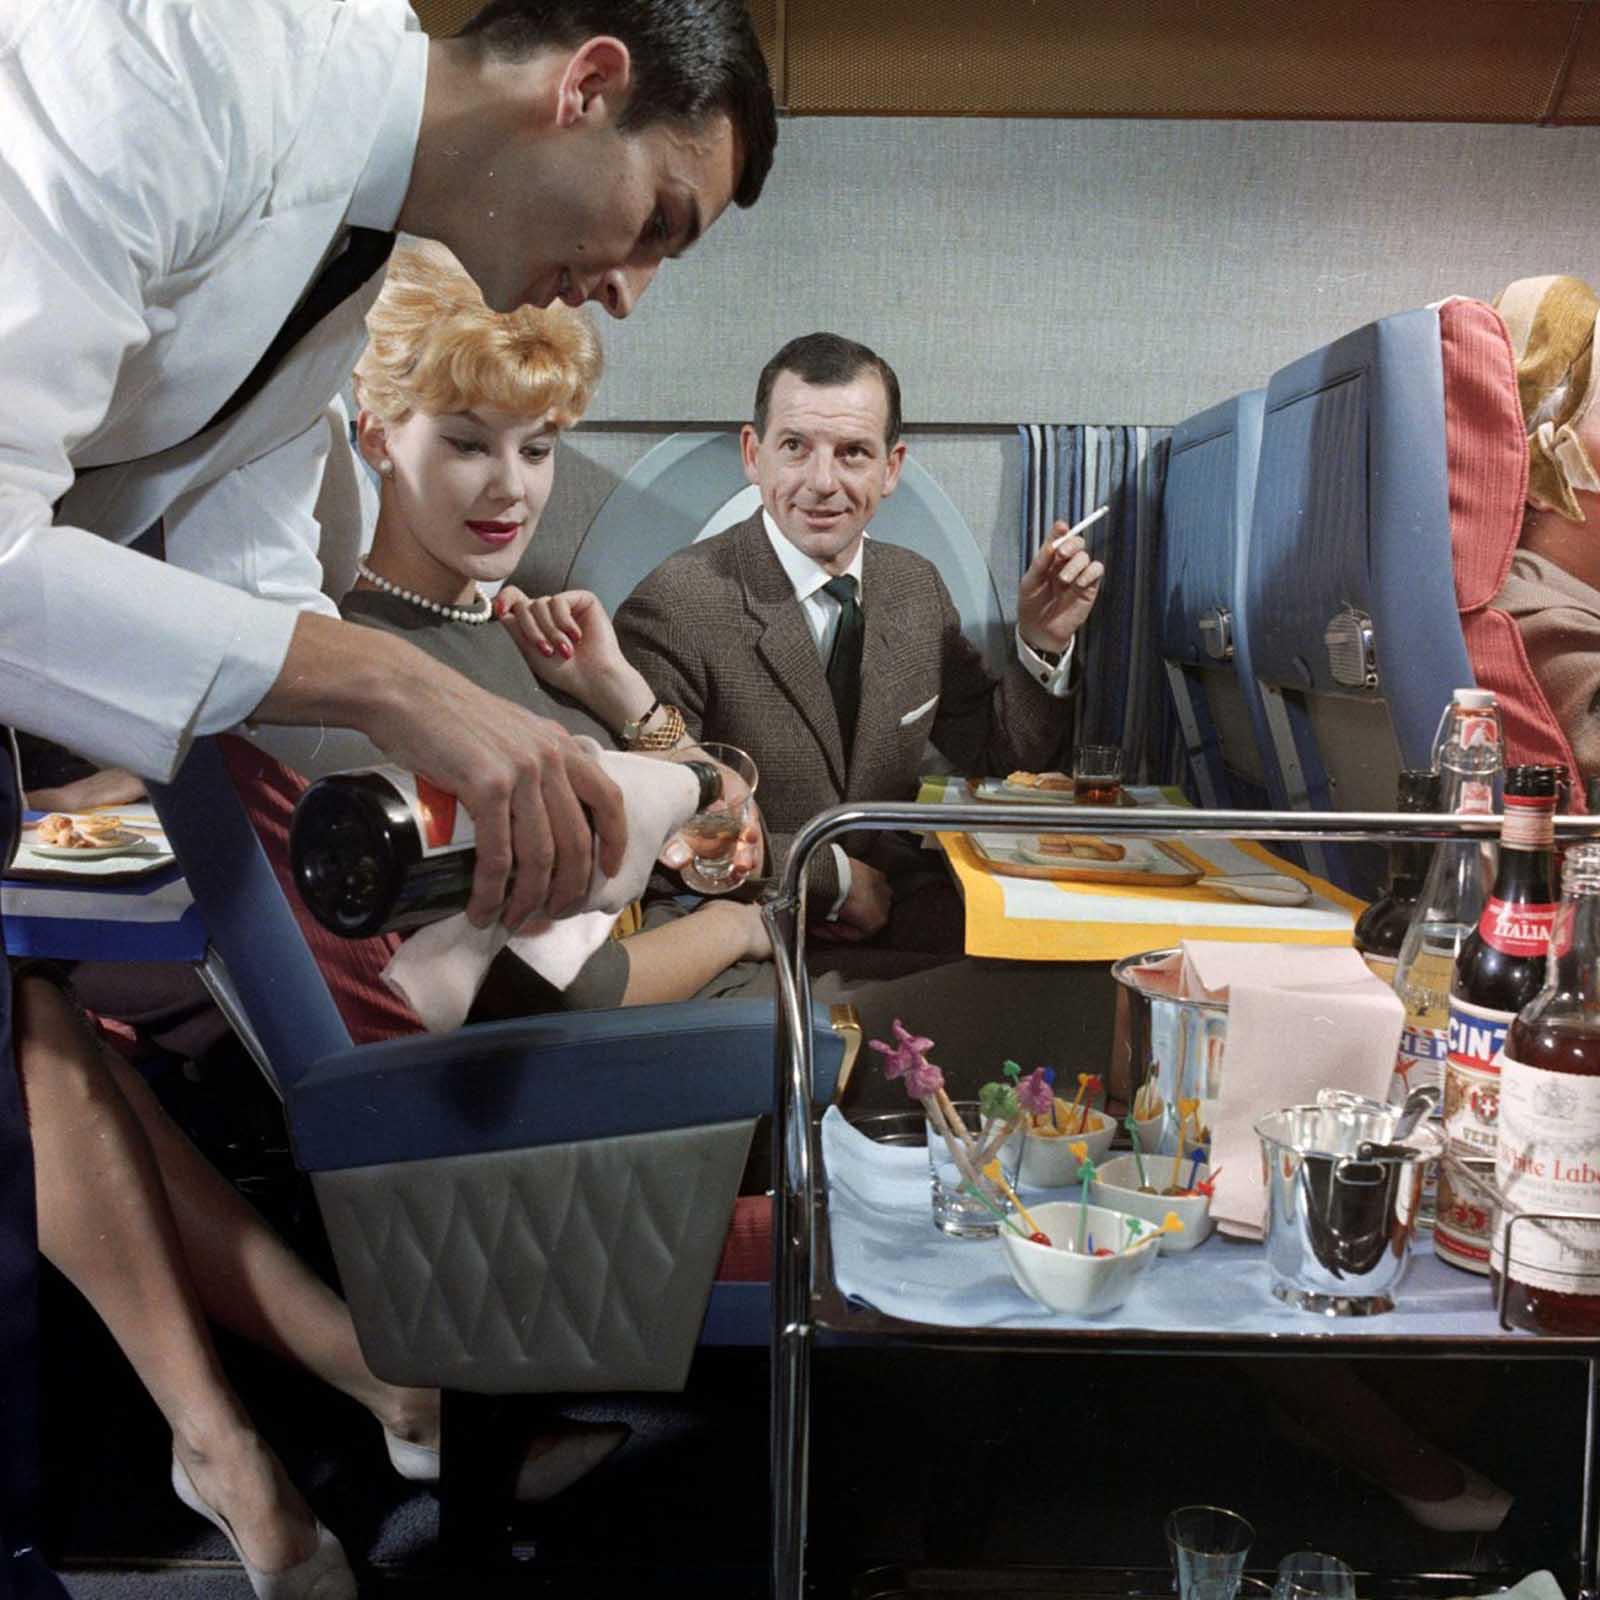 Os passageiros receberam álcool ilimitado.